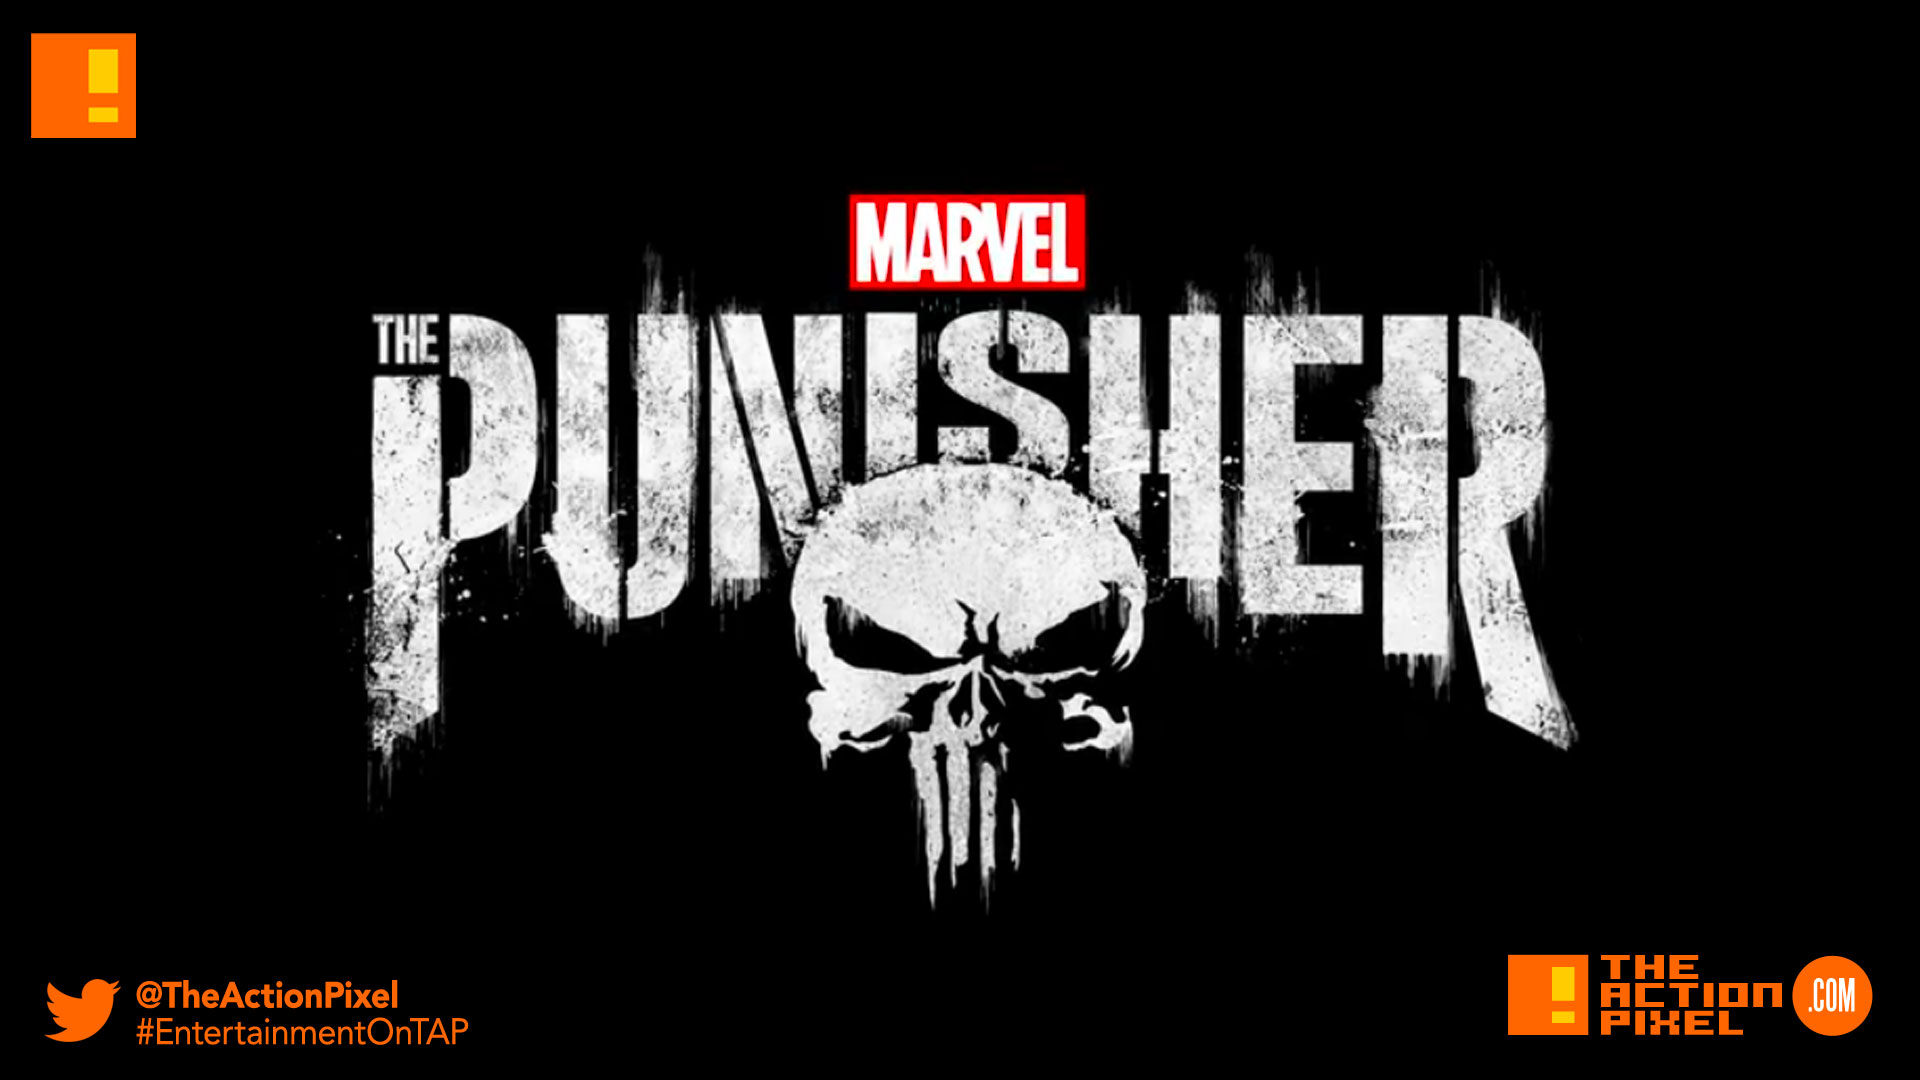 logo, the punisher, karen page, the action pixel, marvel, netflix, new york, Deborah Ann Woll, jon bernthal,netflix, marvel,